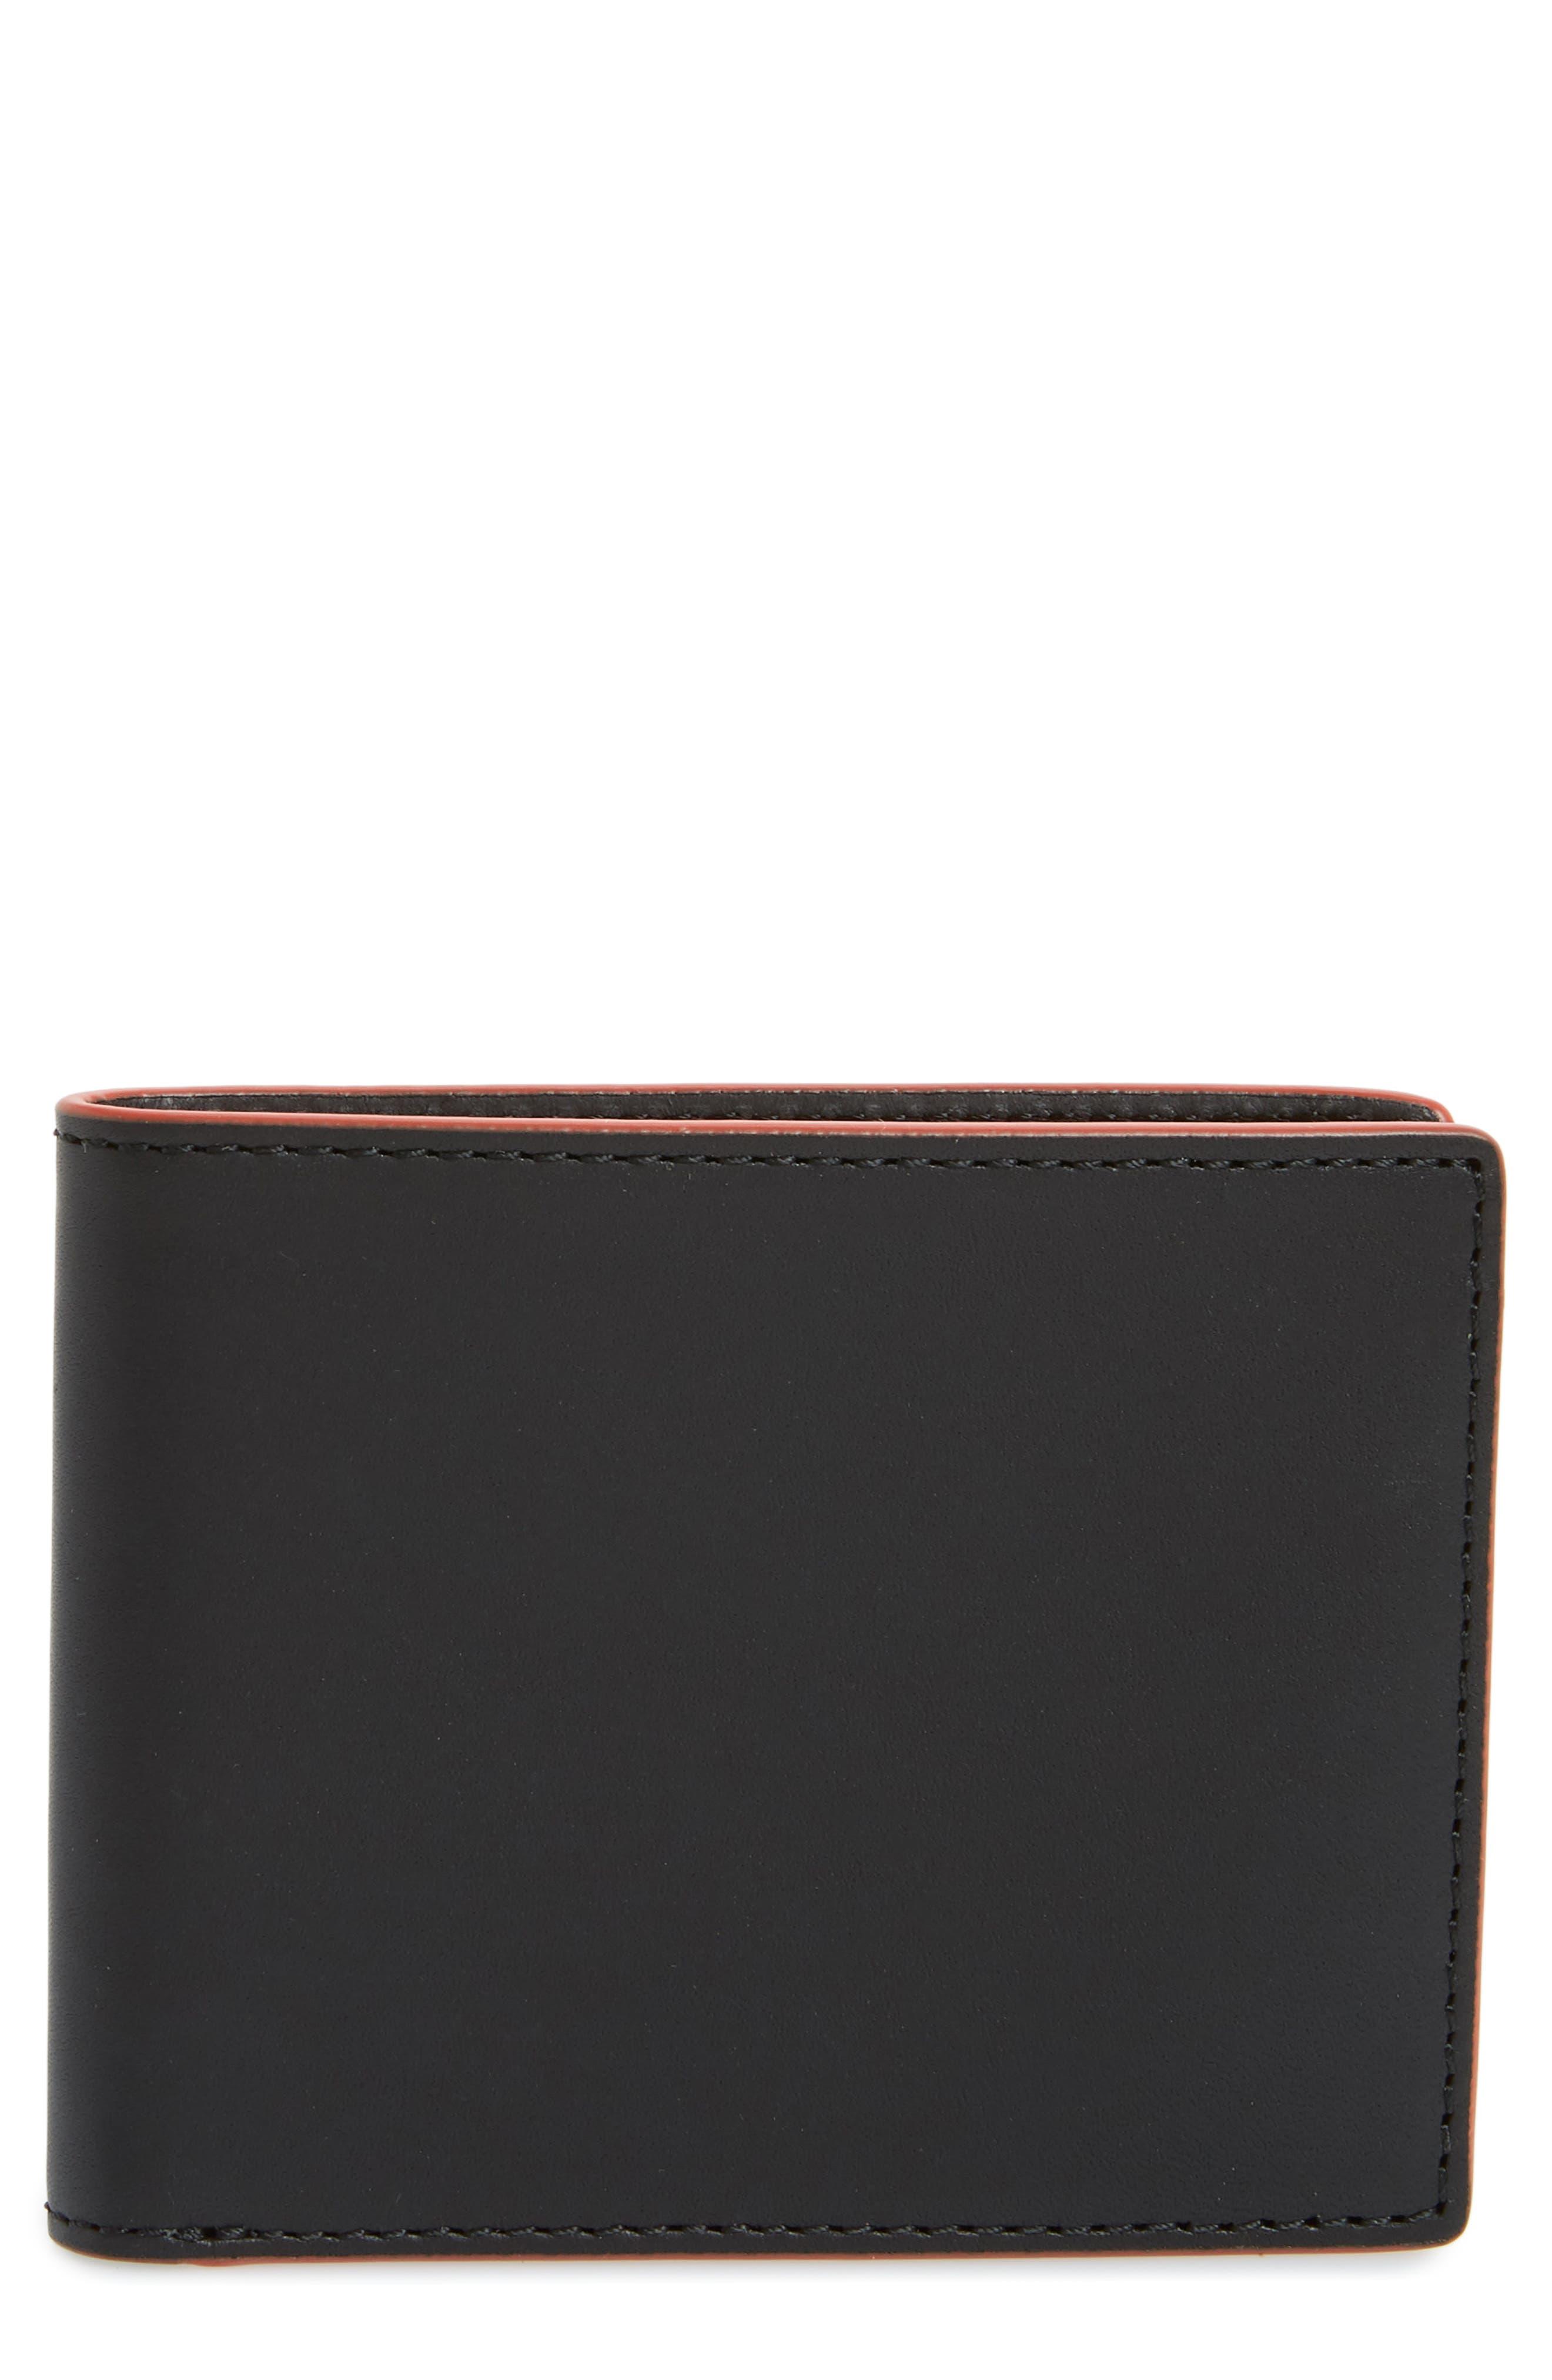 RAG & BONE, Hampshire Leather Bifold Wallet, Main thumbnail 1, color, BLACK COMBO